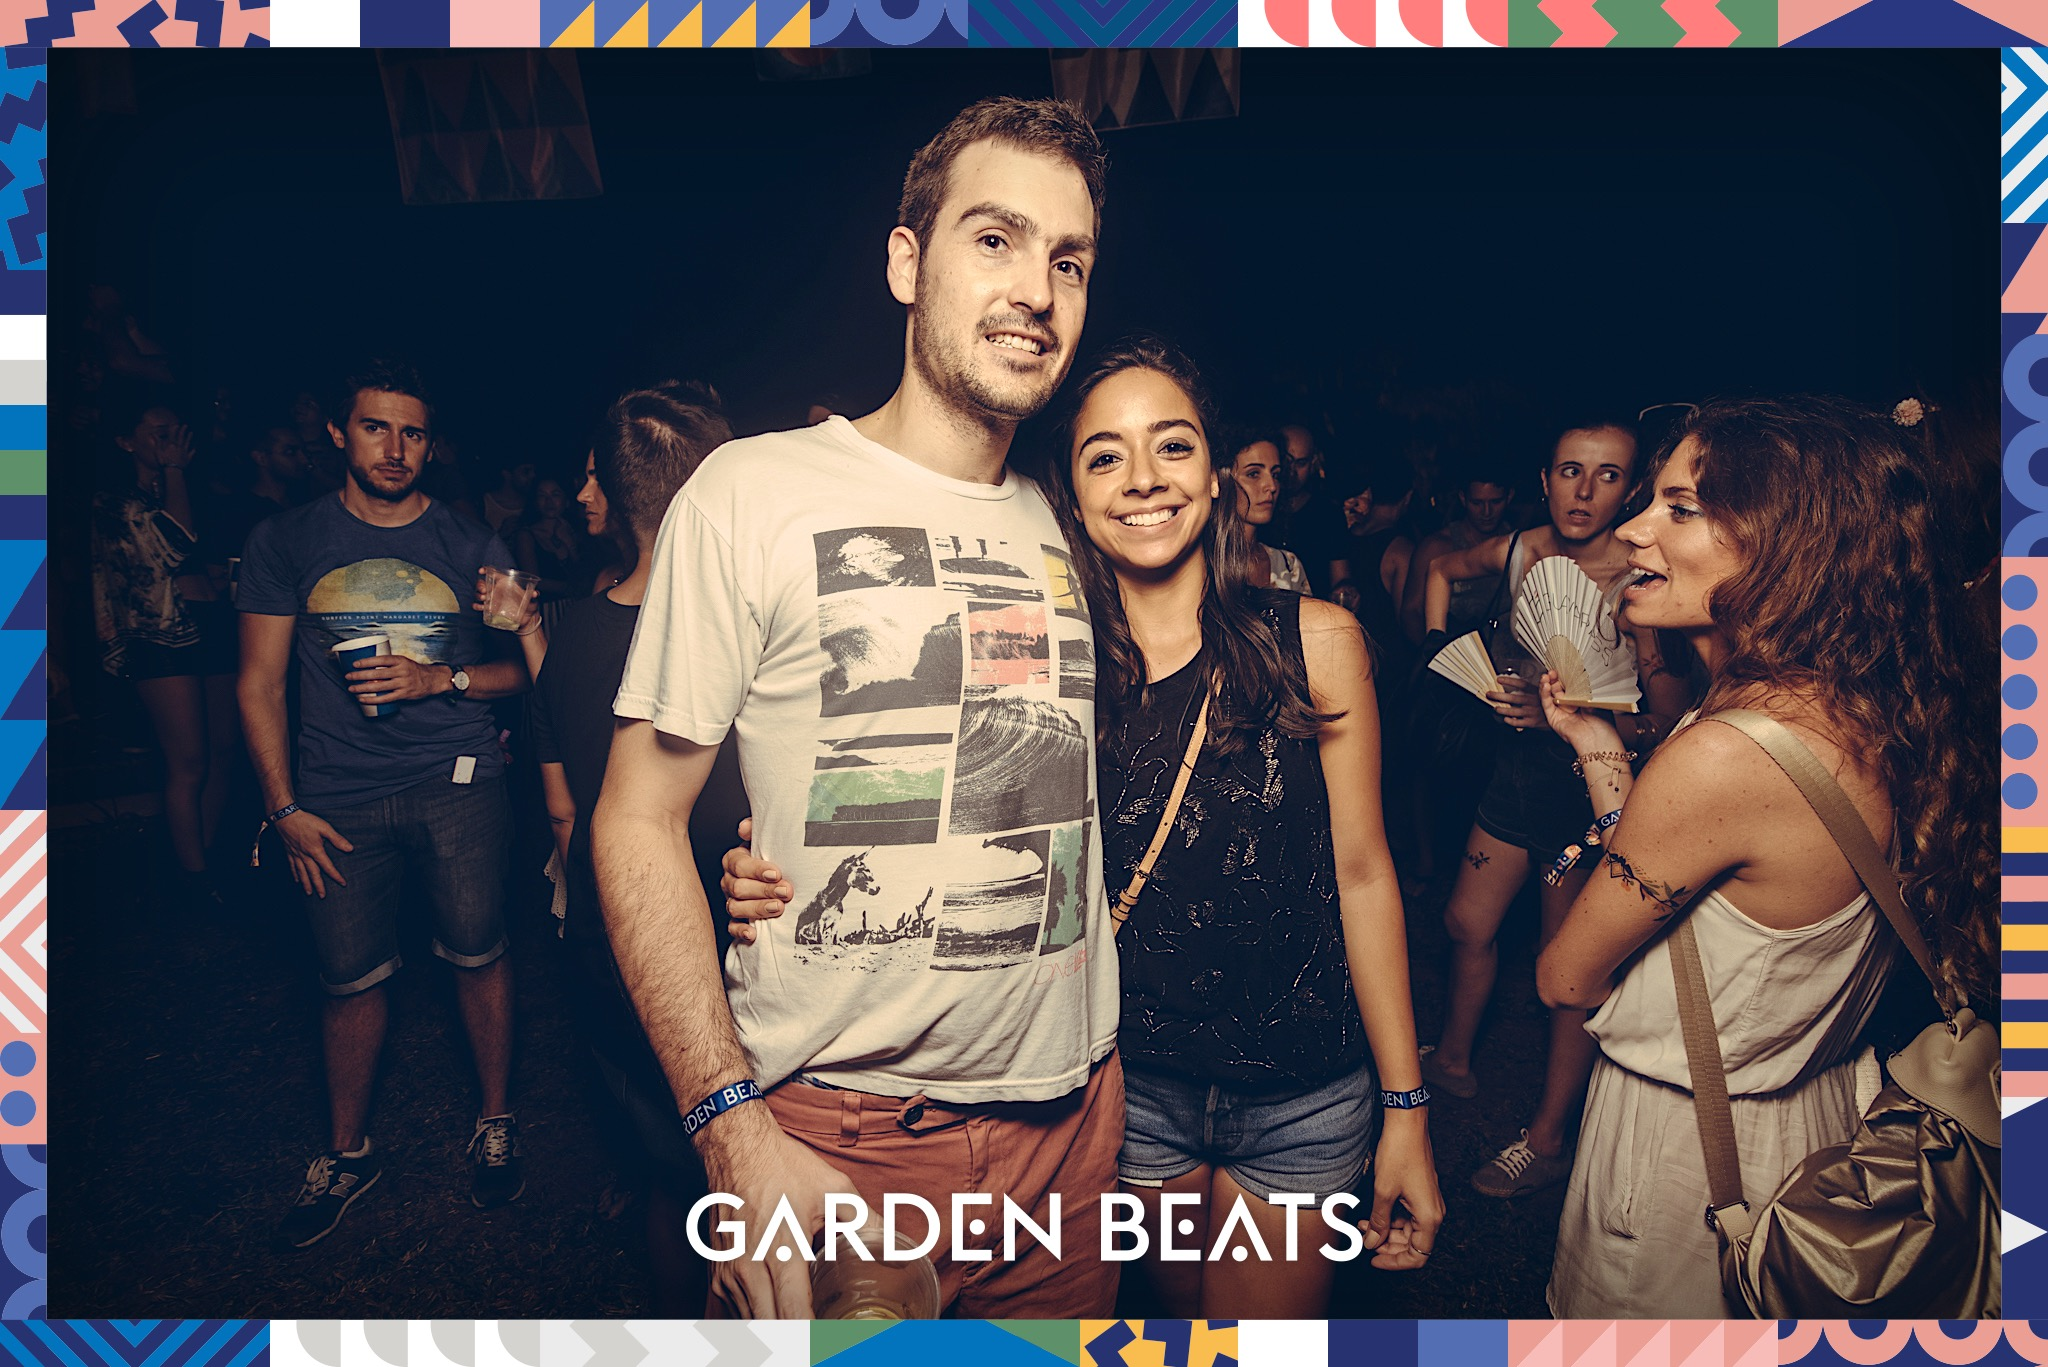 18032017_GardenBeats_Colossal810_WatermarkedGB.jpg